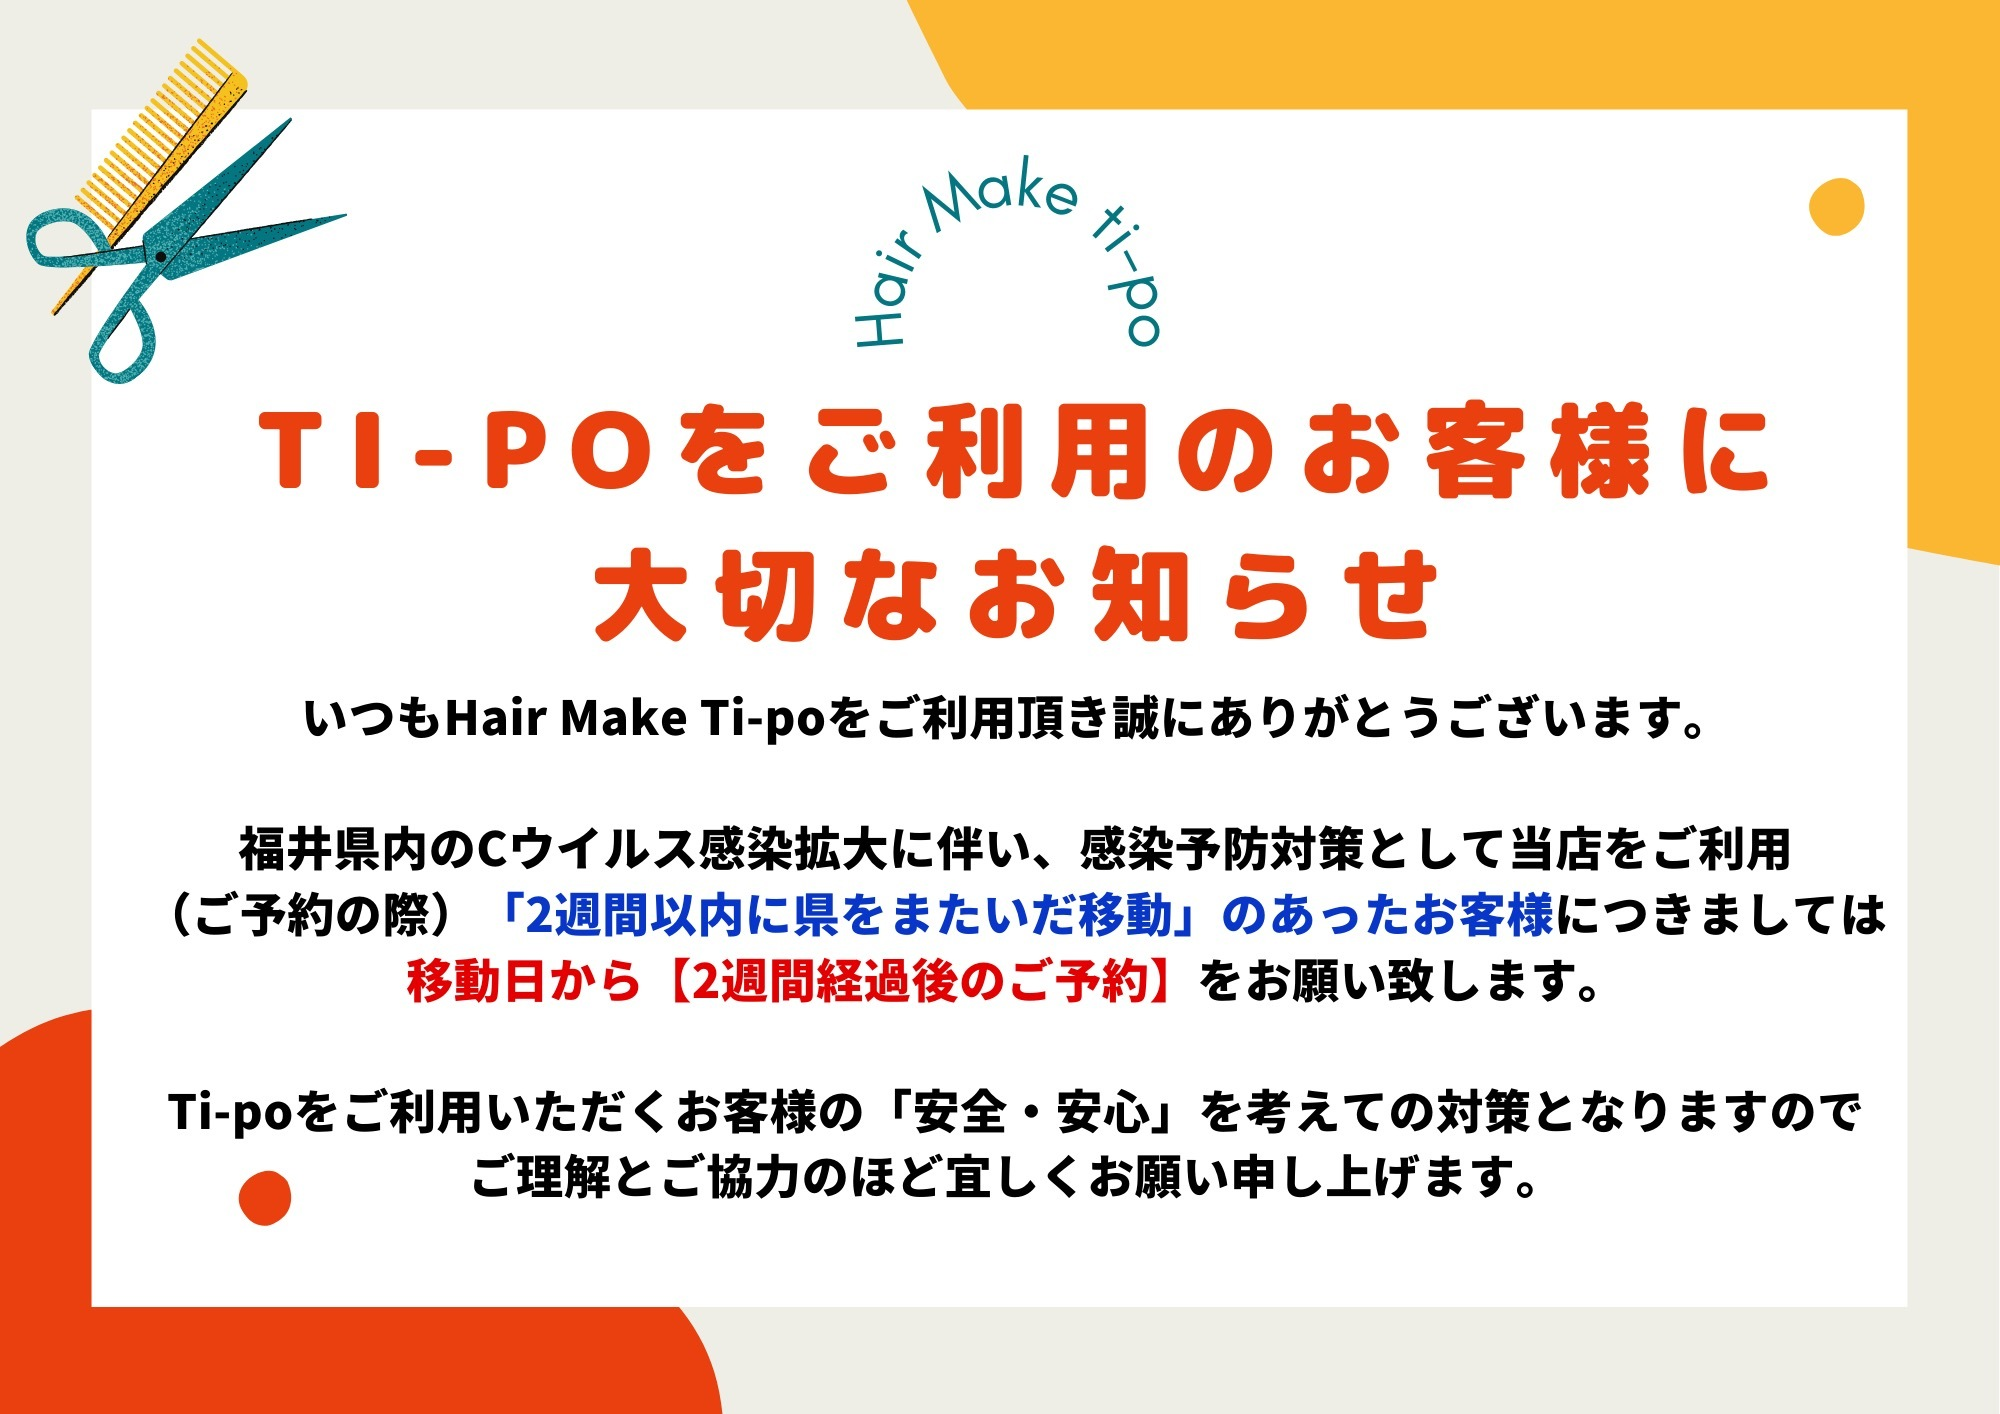 ☆★TI-POをご利用のお客様に大切なお知らせ★☆